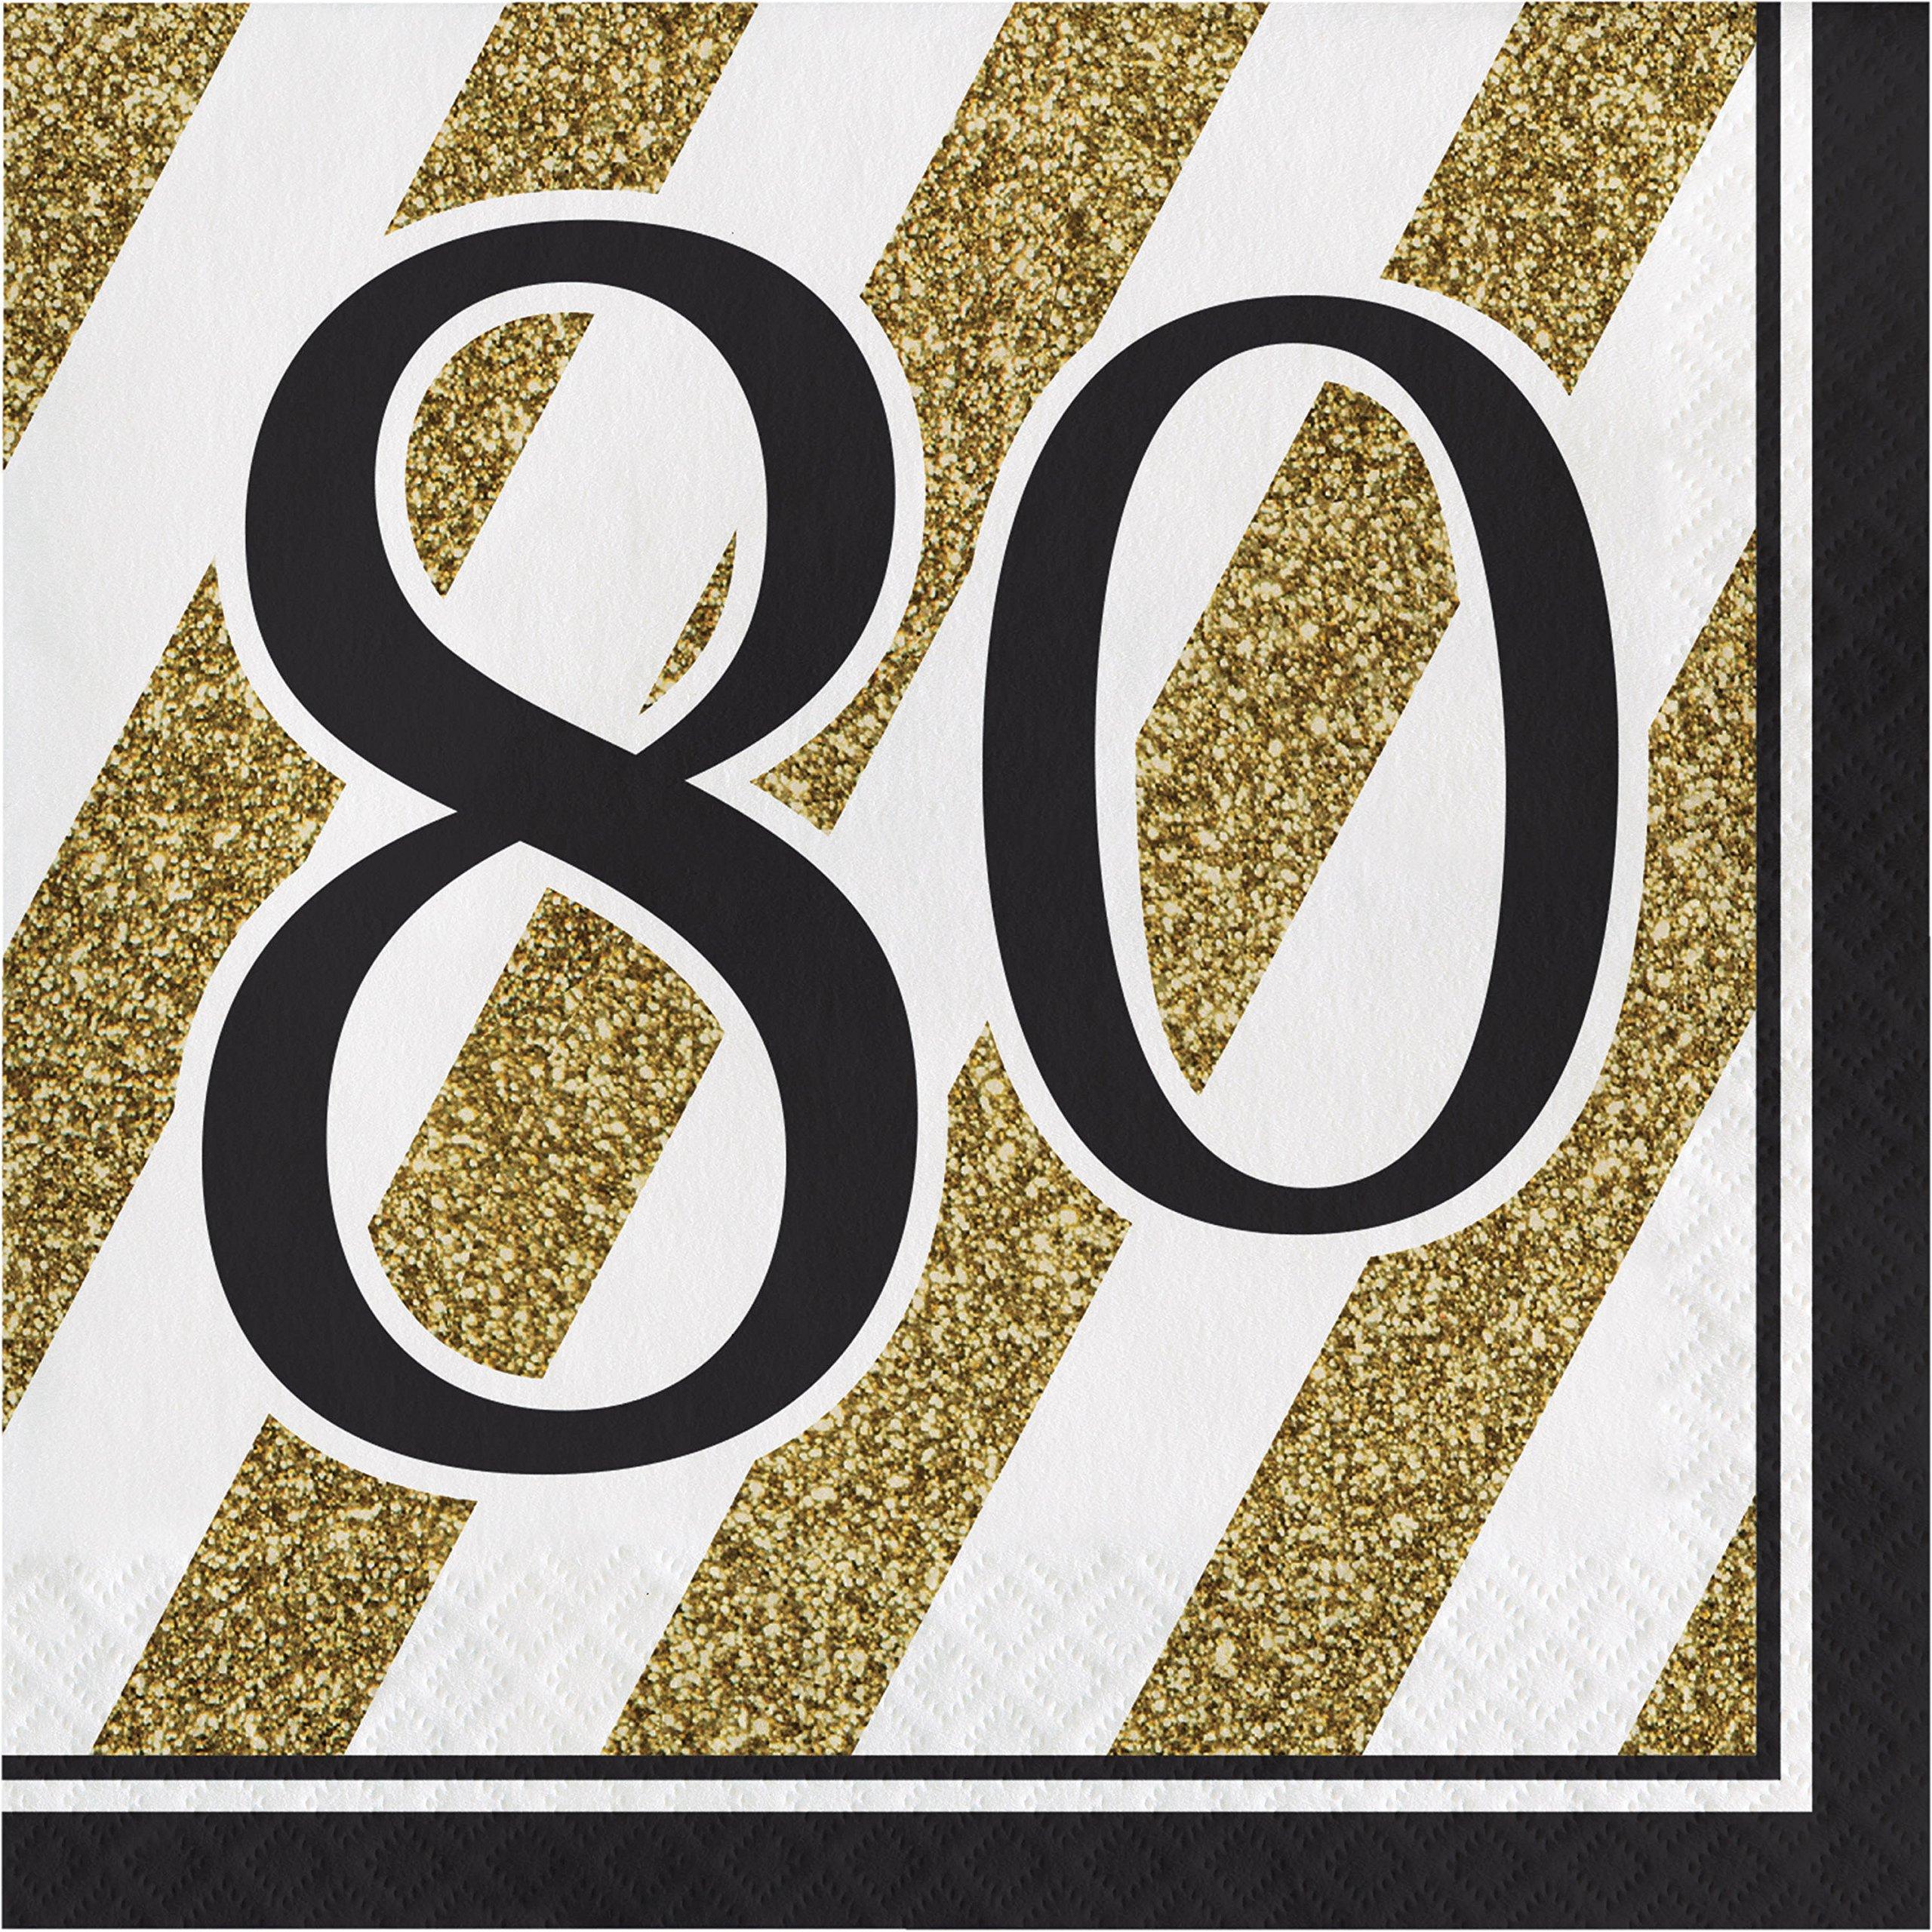 Black and Gold 80th Birthday Napkins, 48 ct